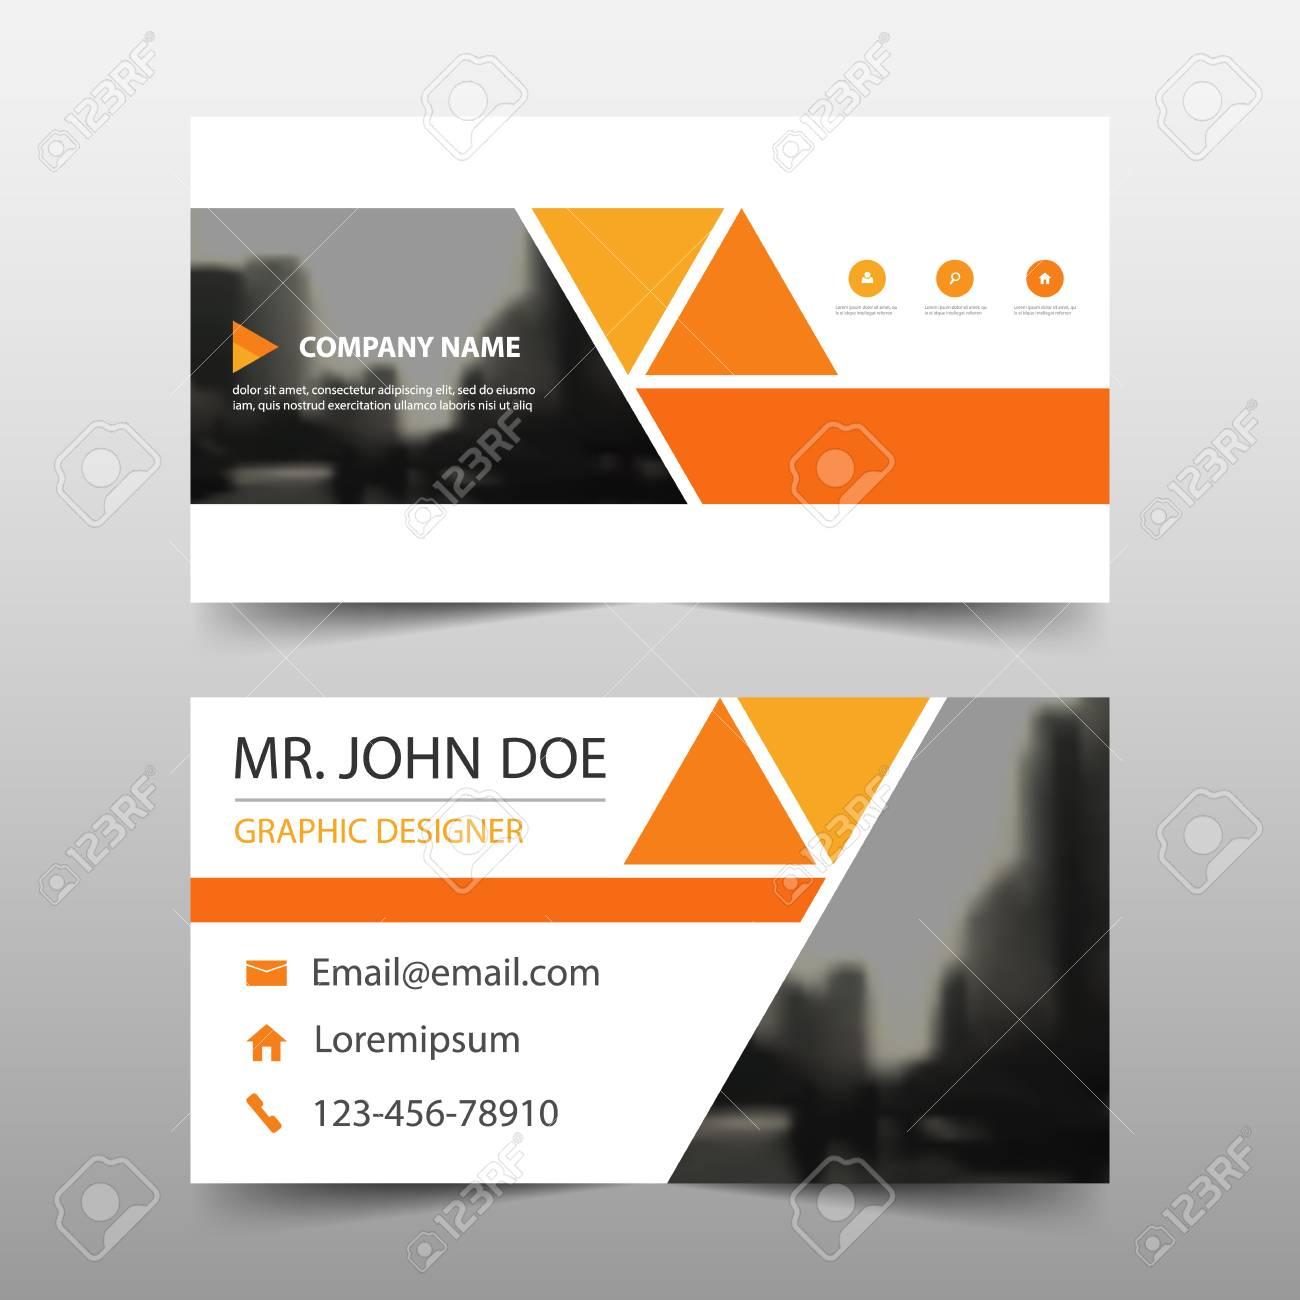 tarjeta de visita corporativa de triángulo naranja plantilla de